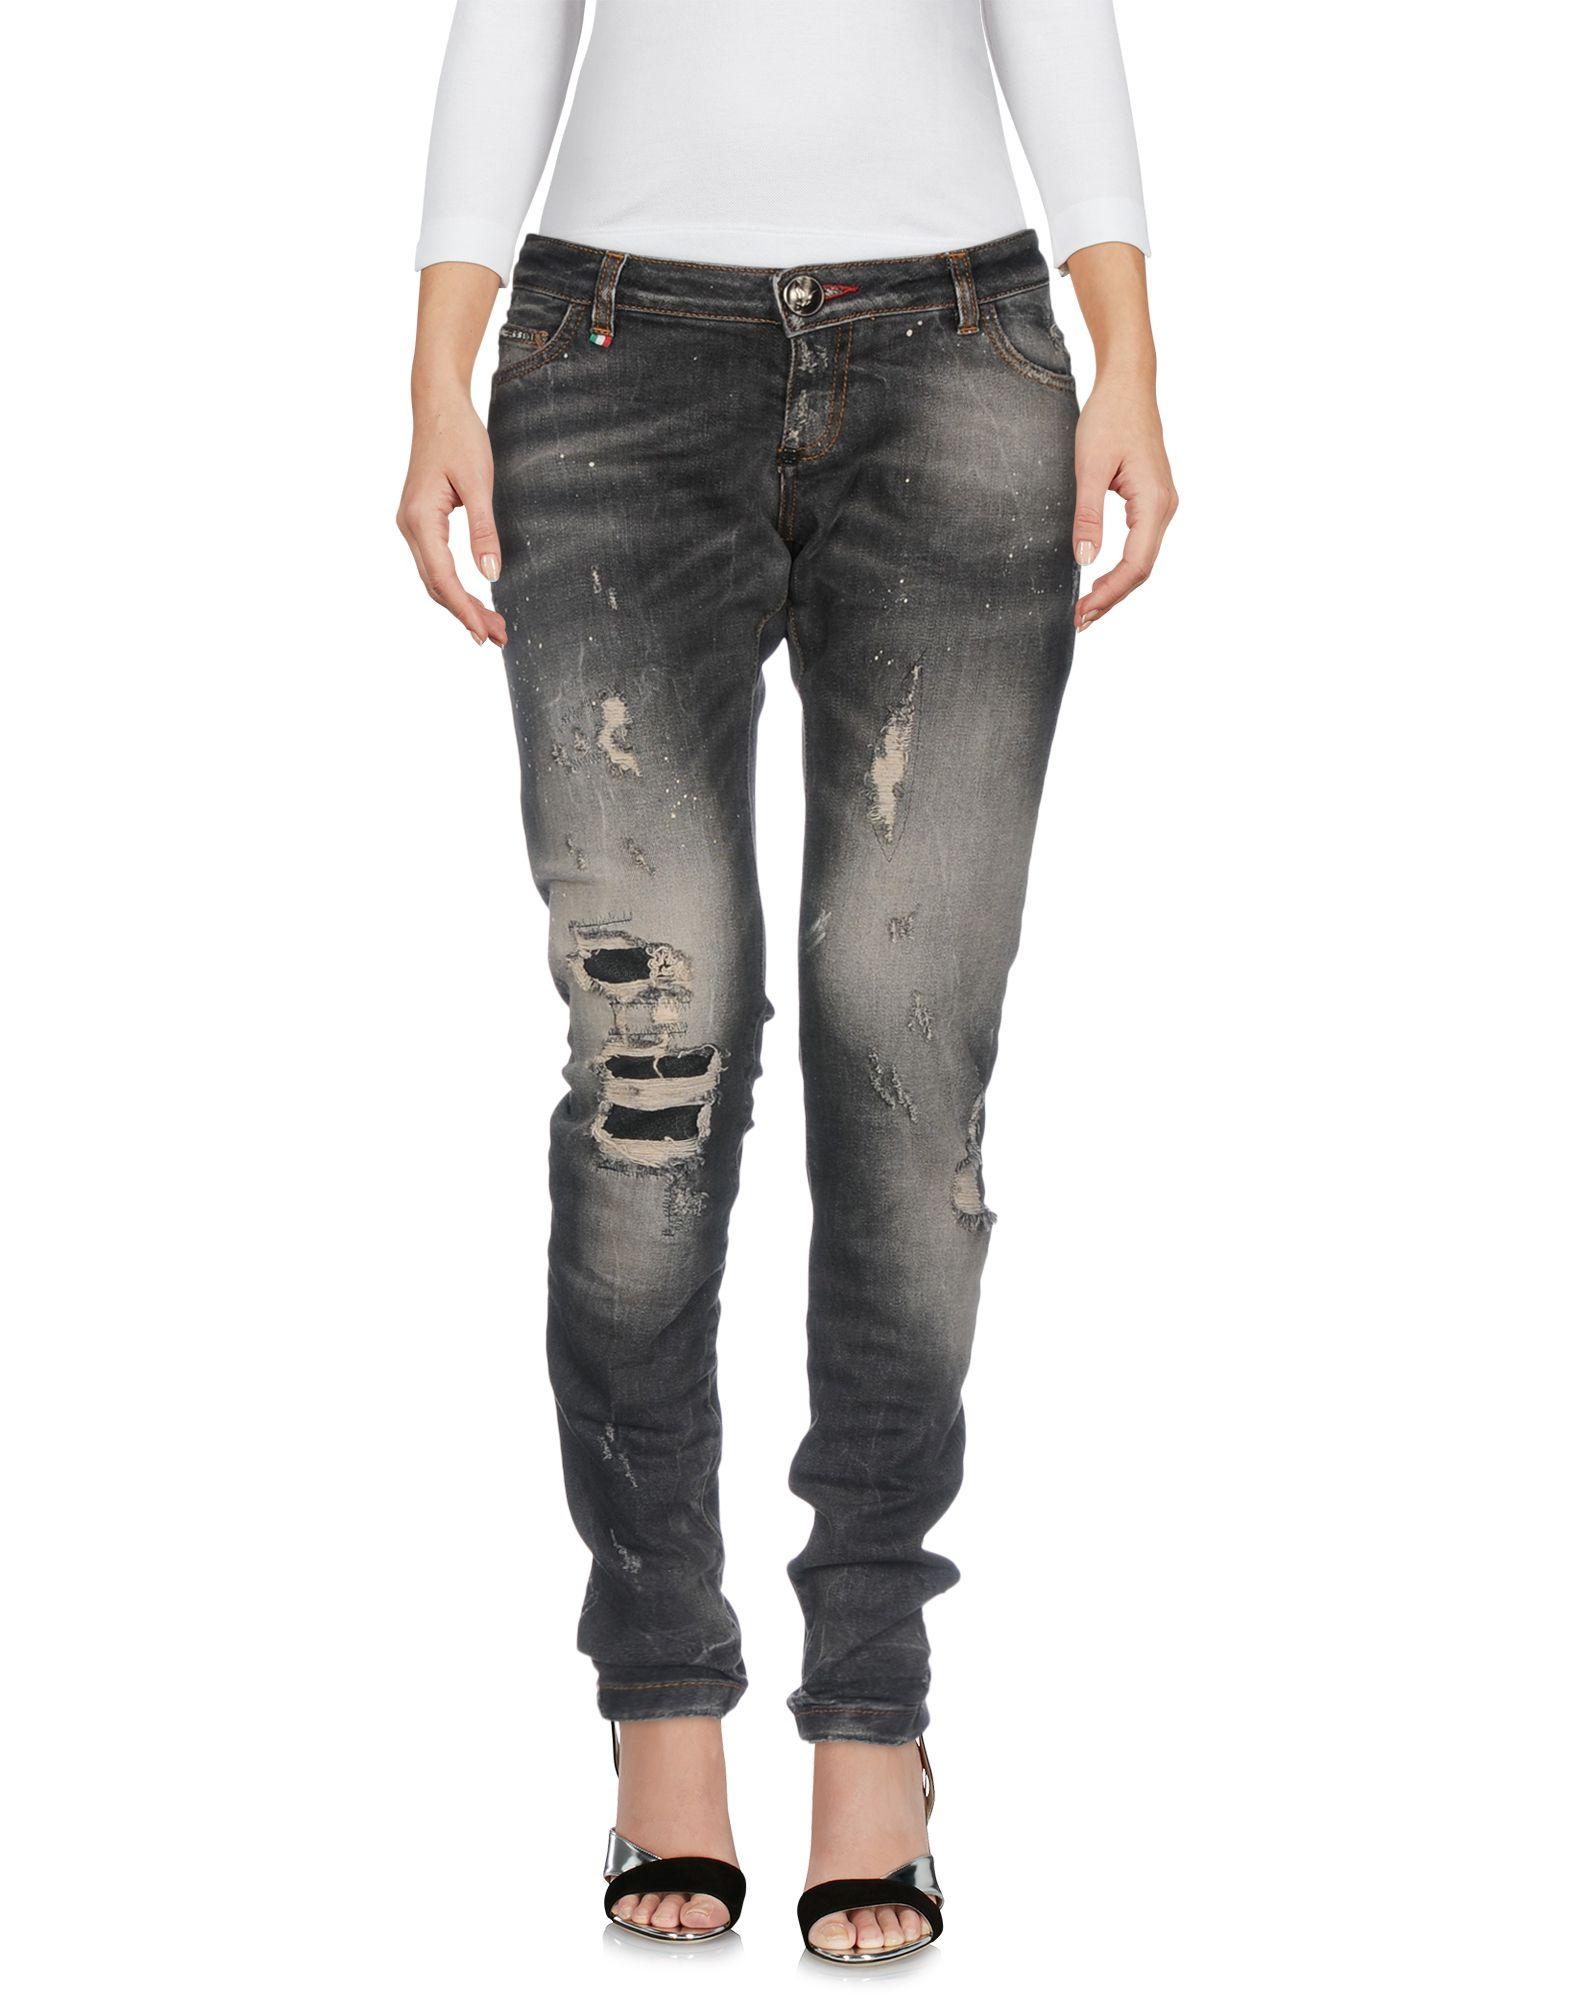 Pantaloni Jeans Philipp Plein Donna - Acquista online su VeYqyJ0R